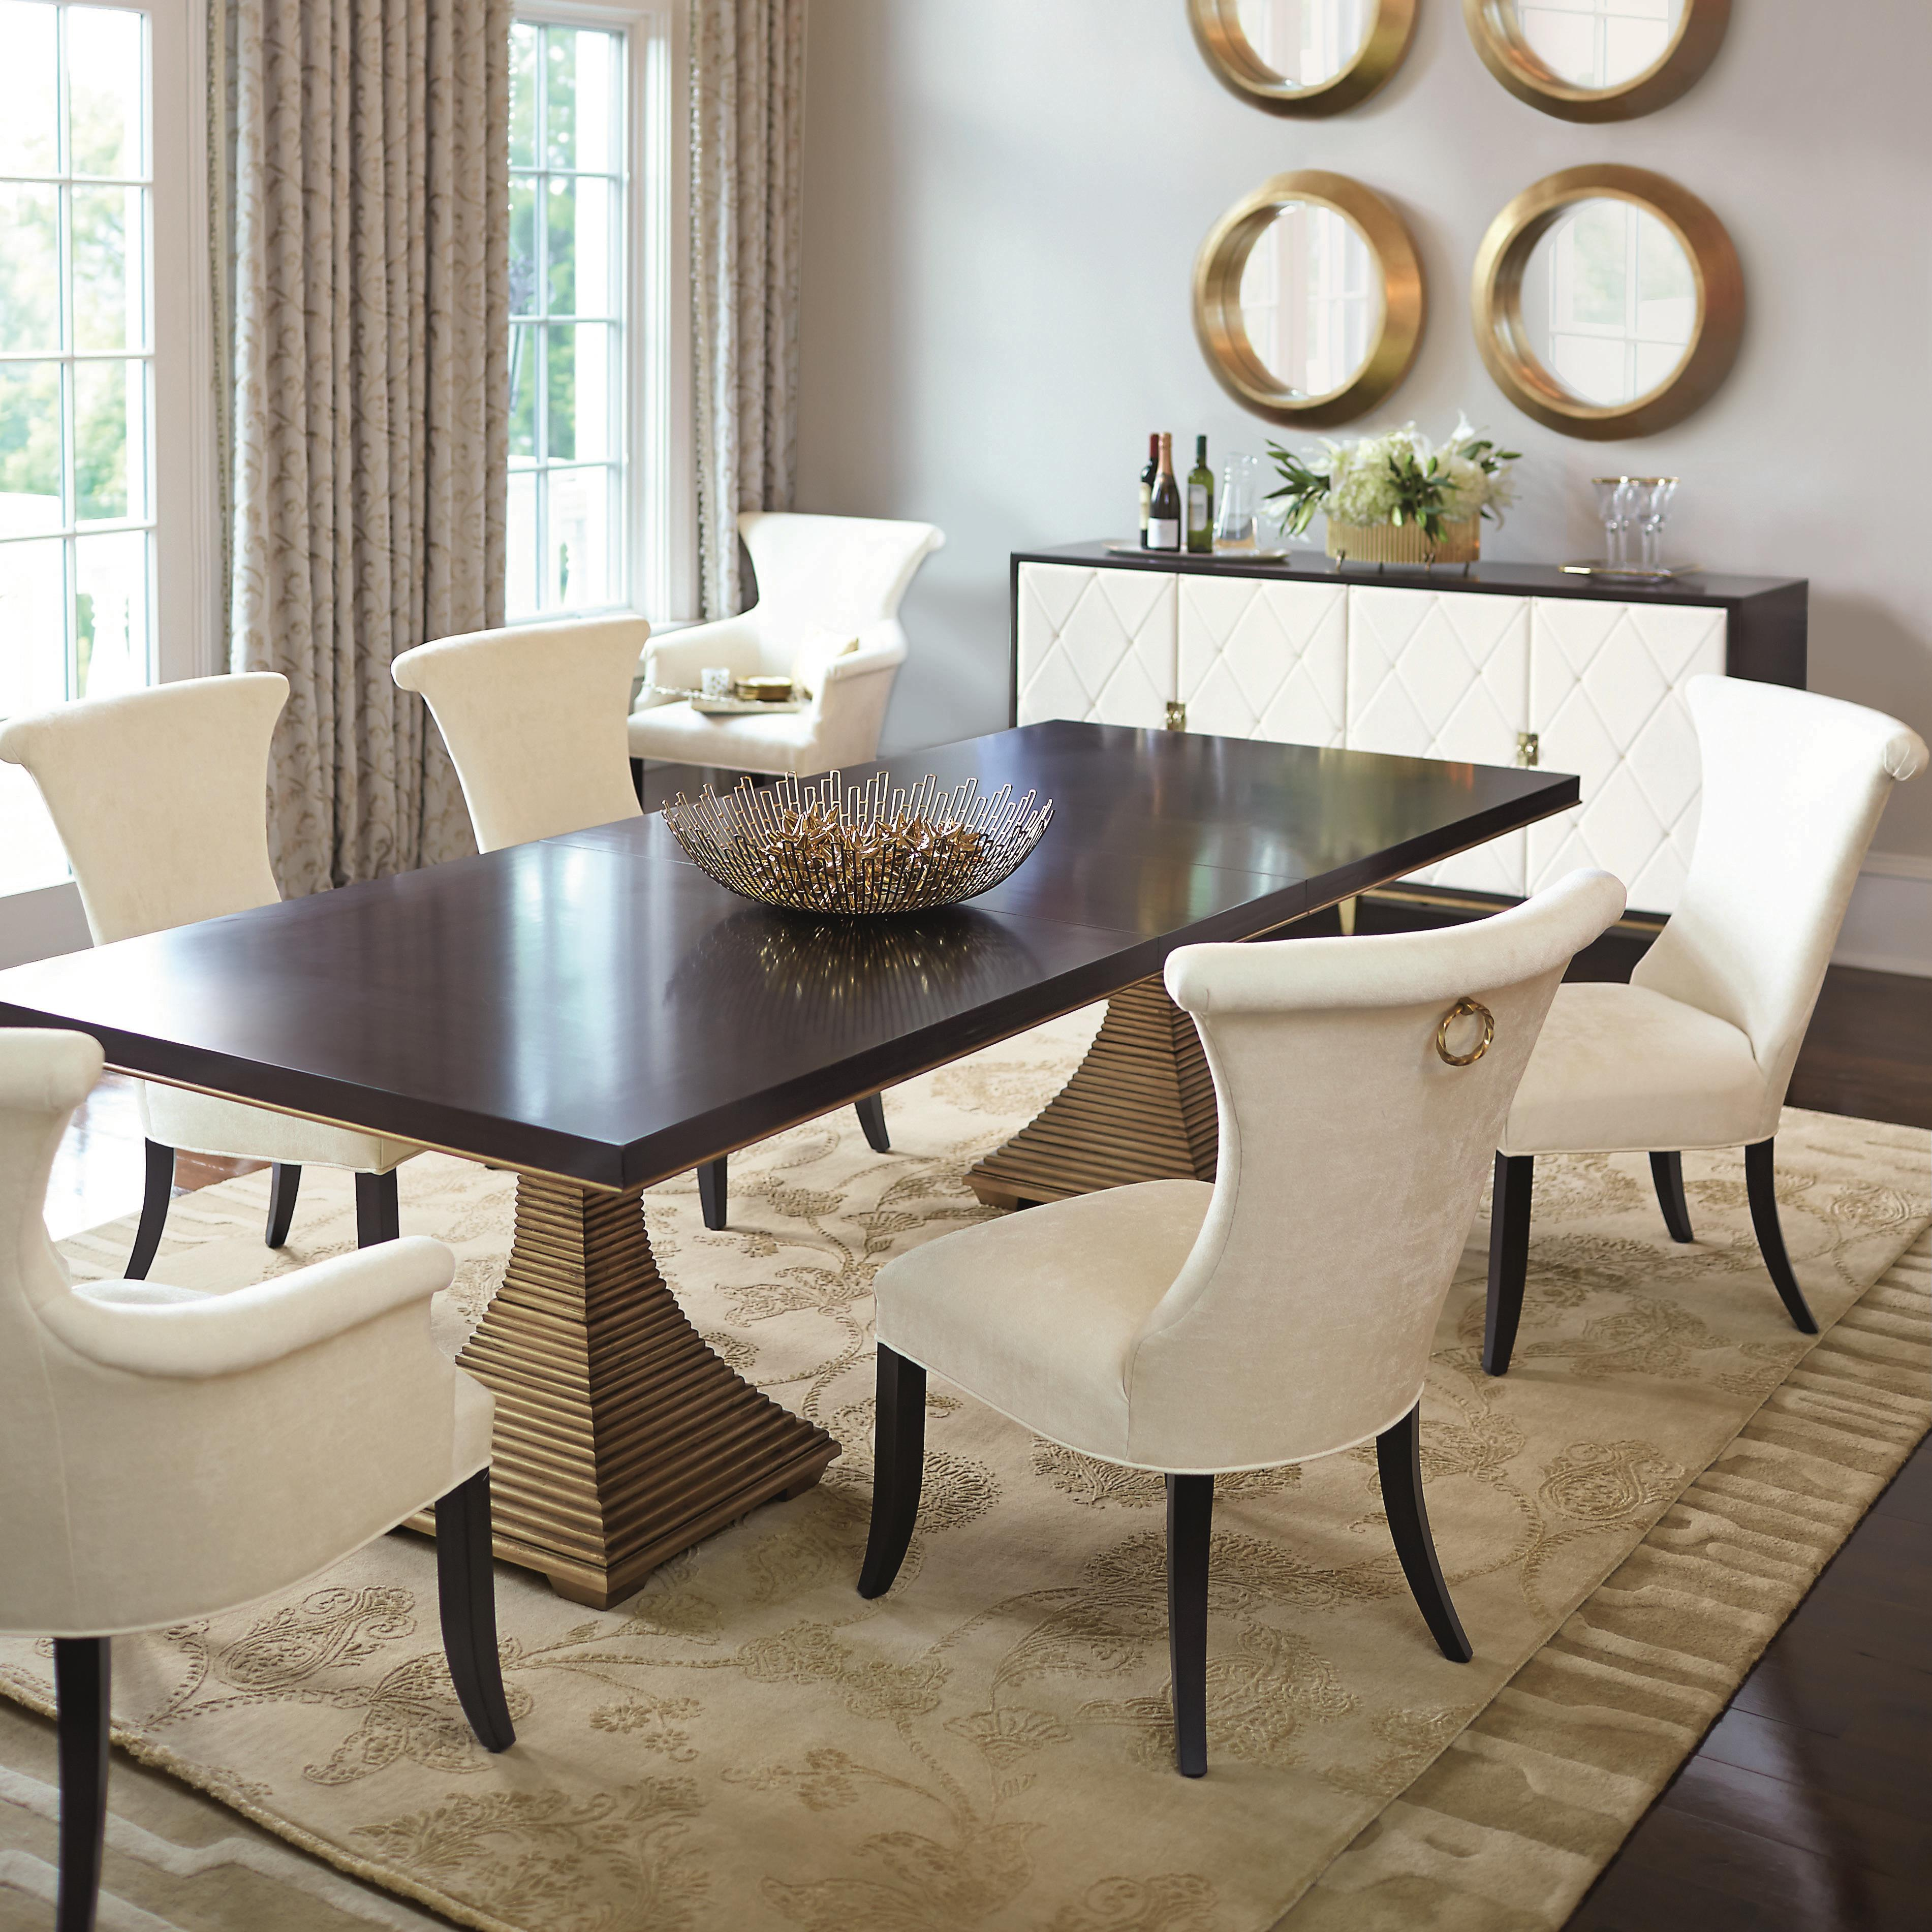 Bernhardt Jet Set Dining Set With Double Pedestal Table